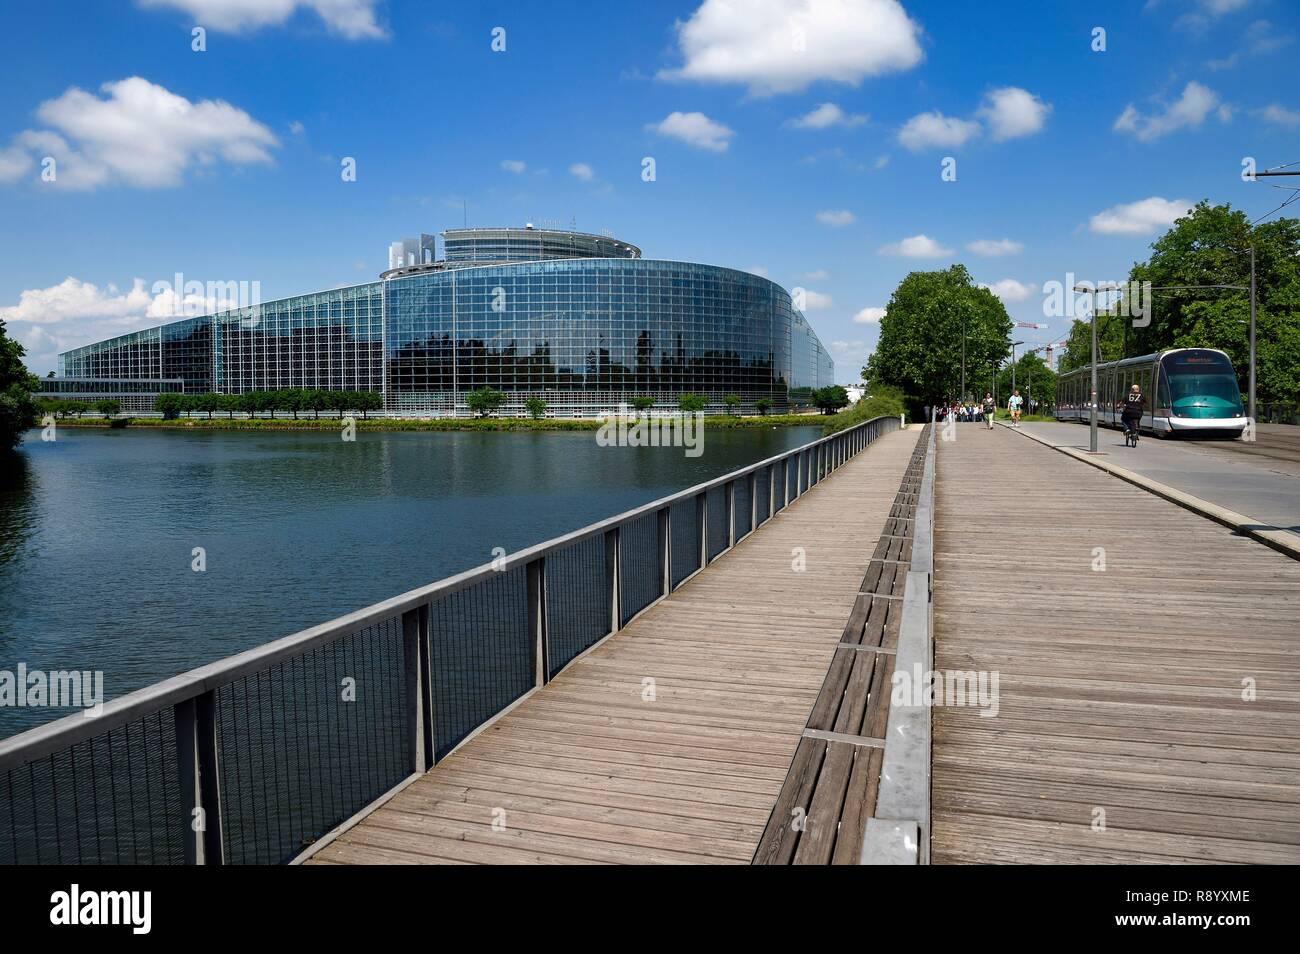 Architecte Bas Rhin france, bas rhin, strasbourg, the european parliament